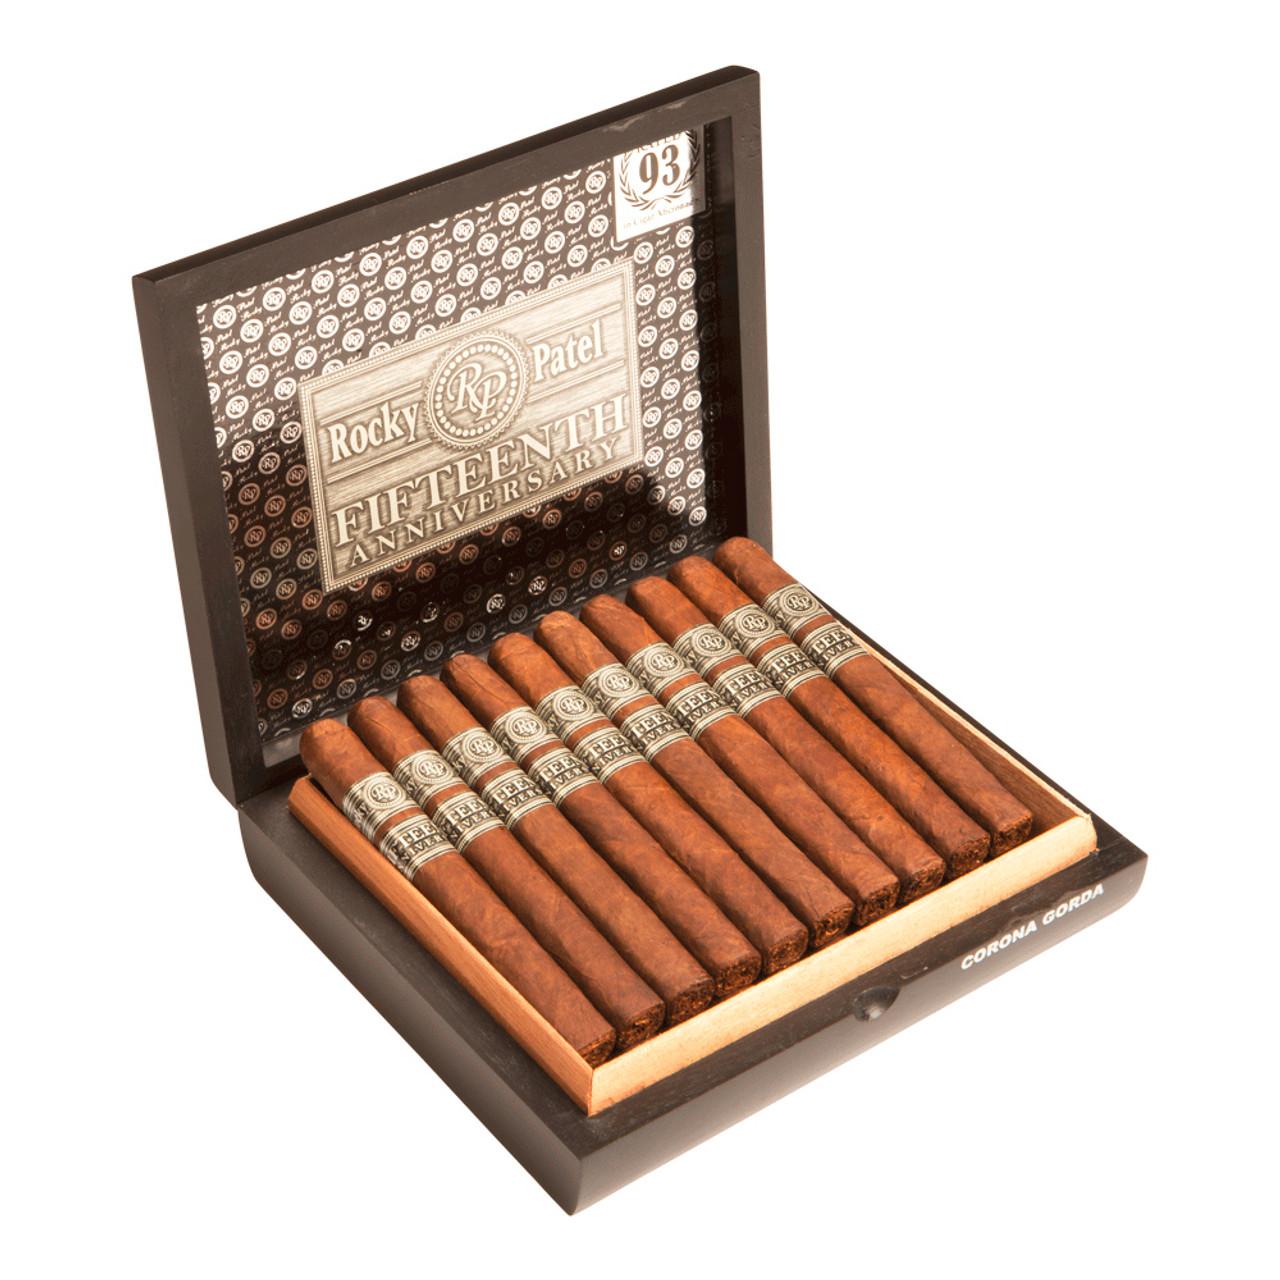 Rocky Patel 15th Anniversary Corona Gorda Cigars - 6.12 x 52 (Box of 20)